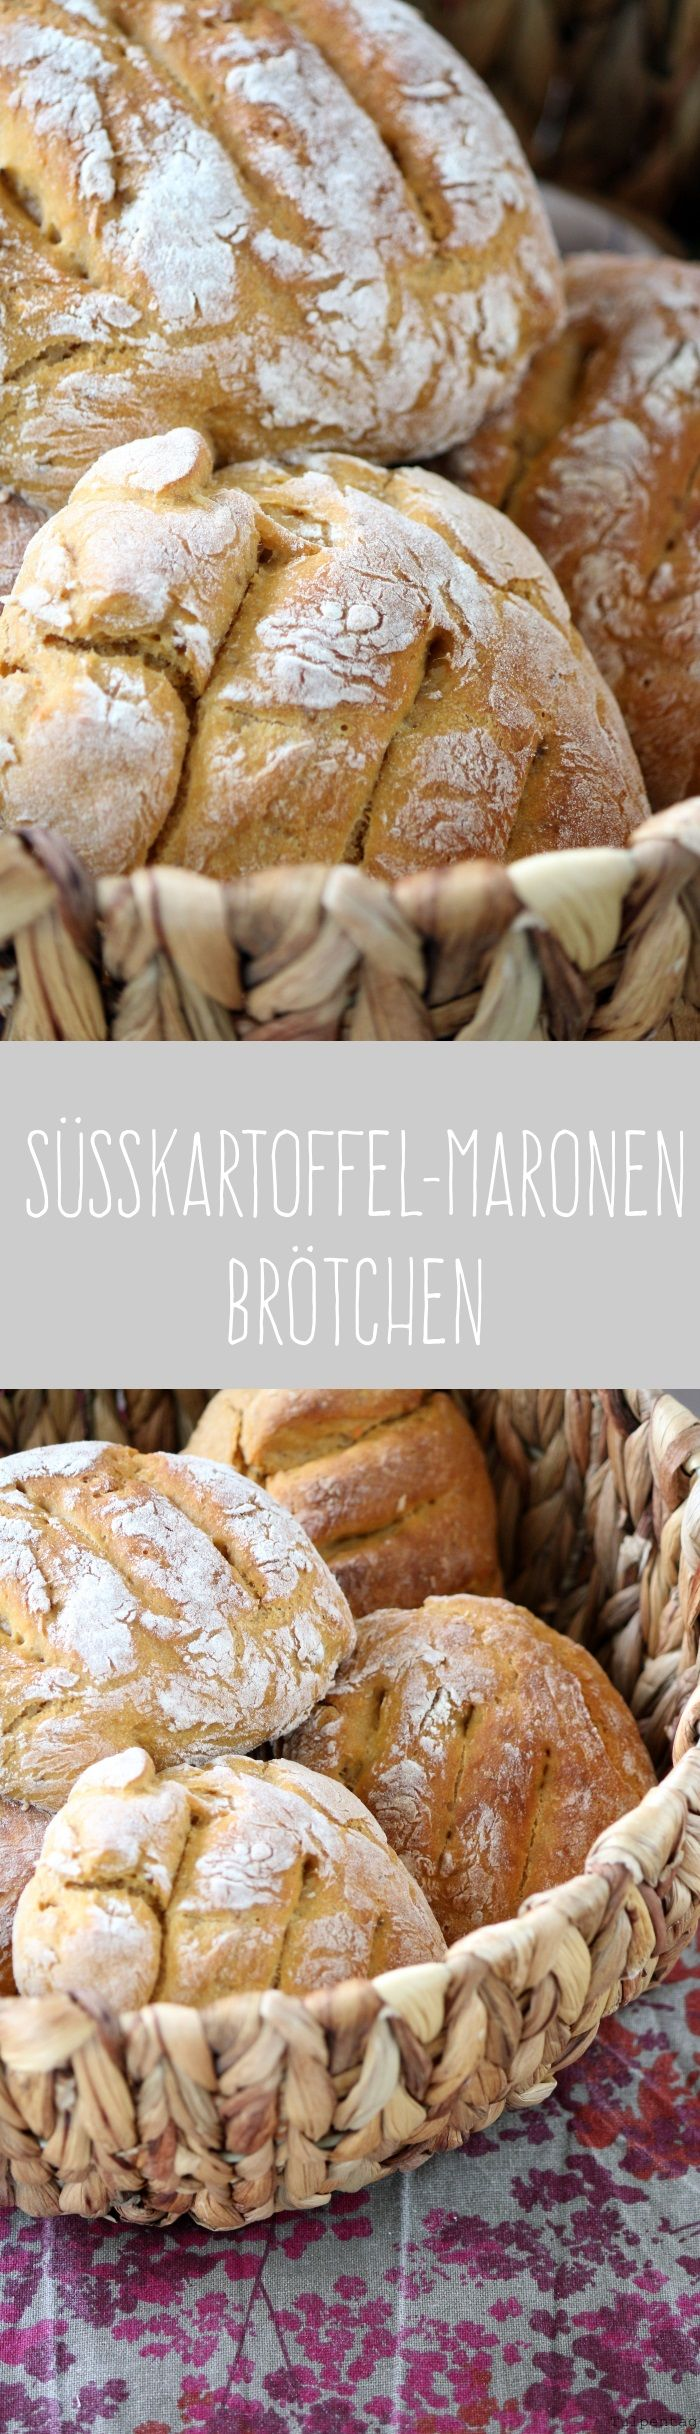 #Süßkartoffel #Brötchen #Backen #Maronen #Rezept